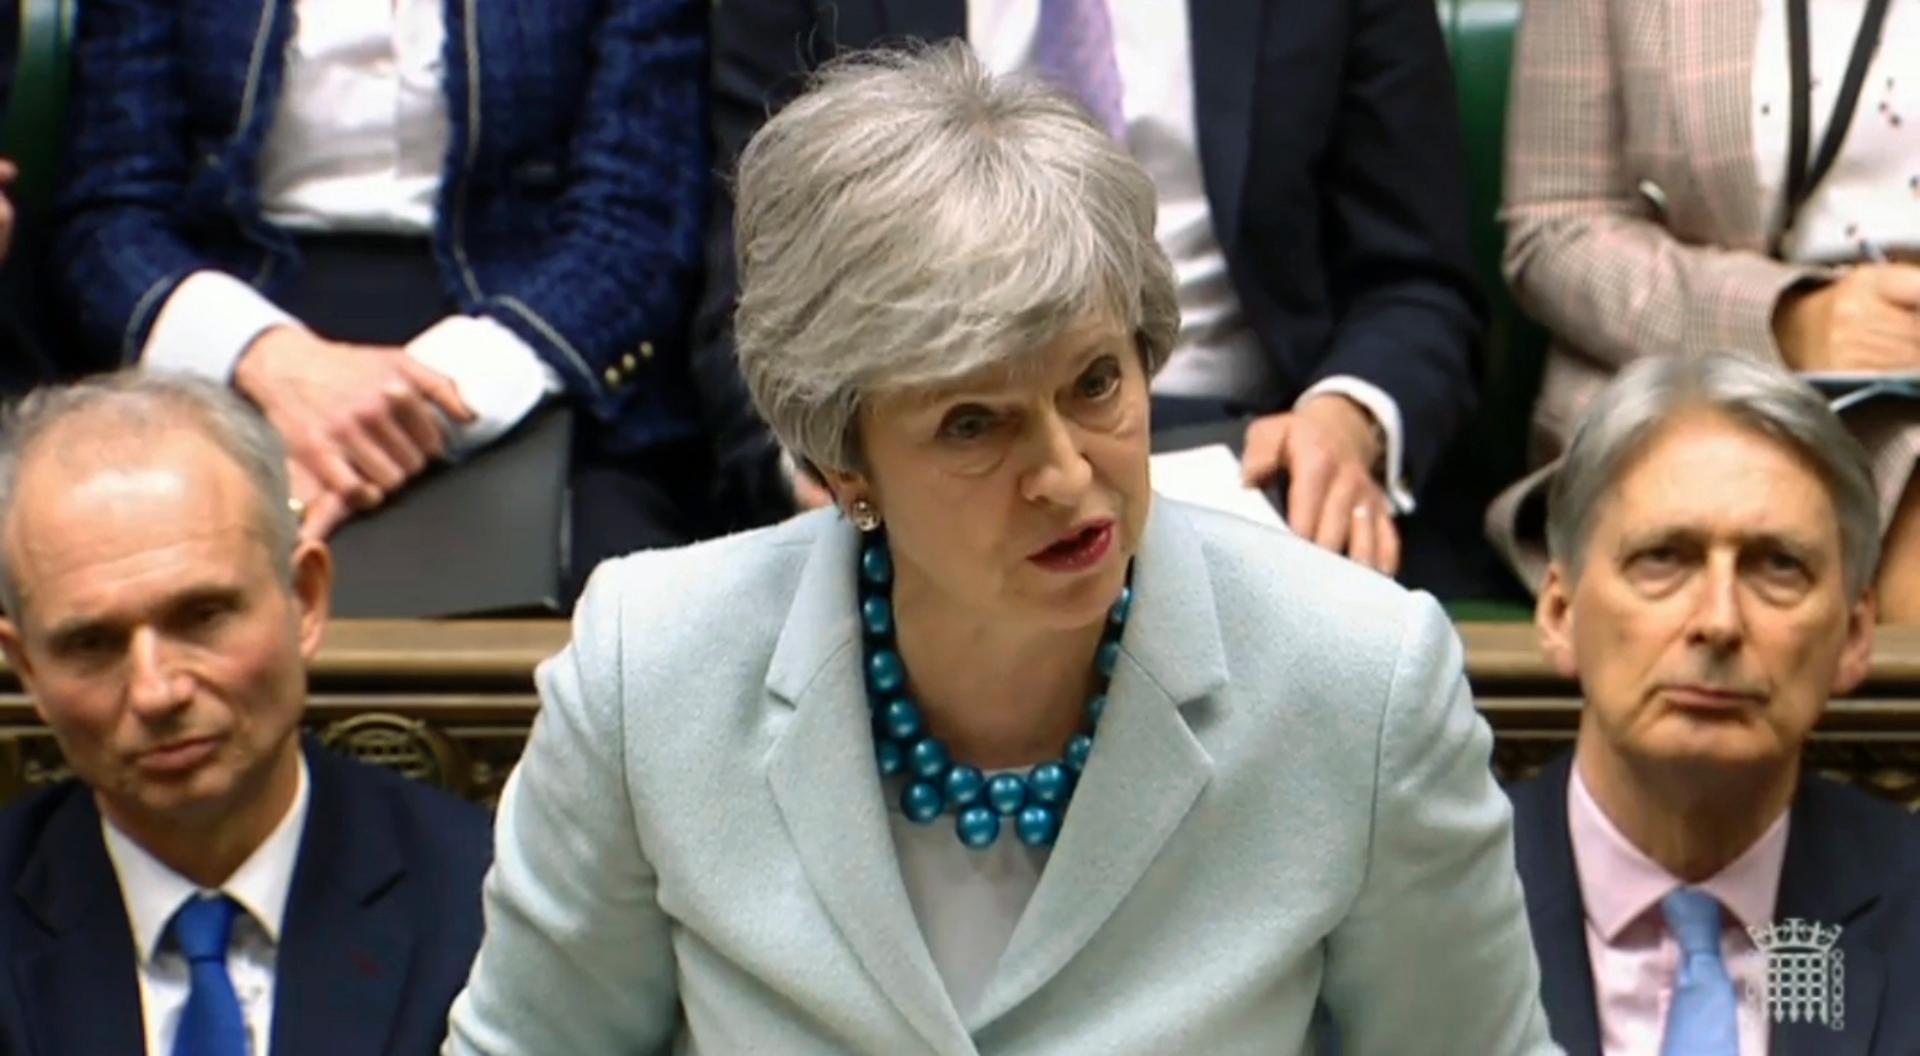 UK government defiant over May's Brexit deal despite setback